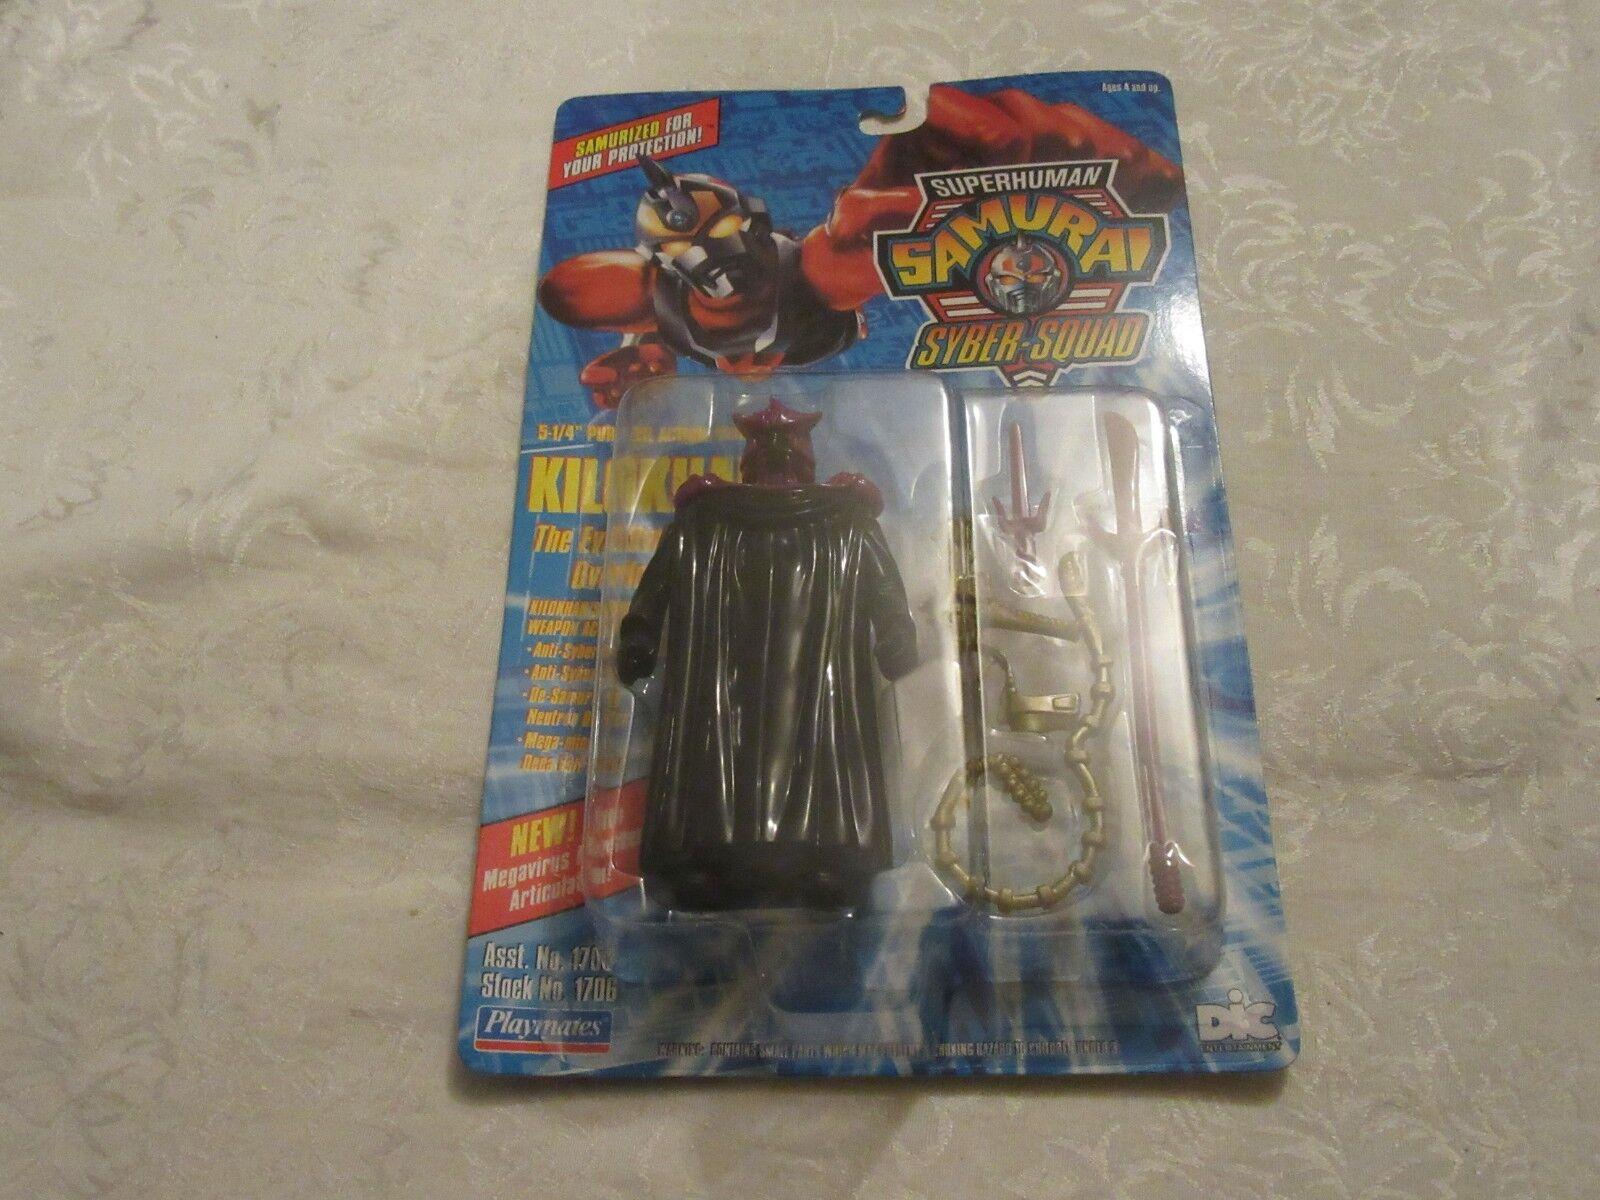 Playmates 1994 Superhuman Samurai Syber-Squad 5 1/4  Kilokhan Action Figure